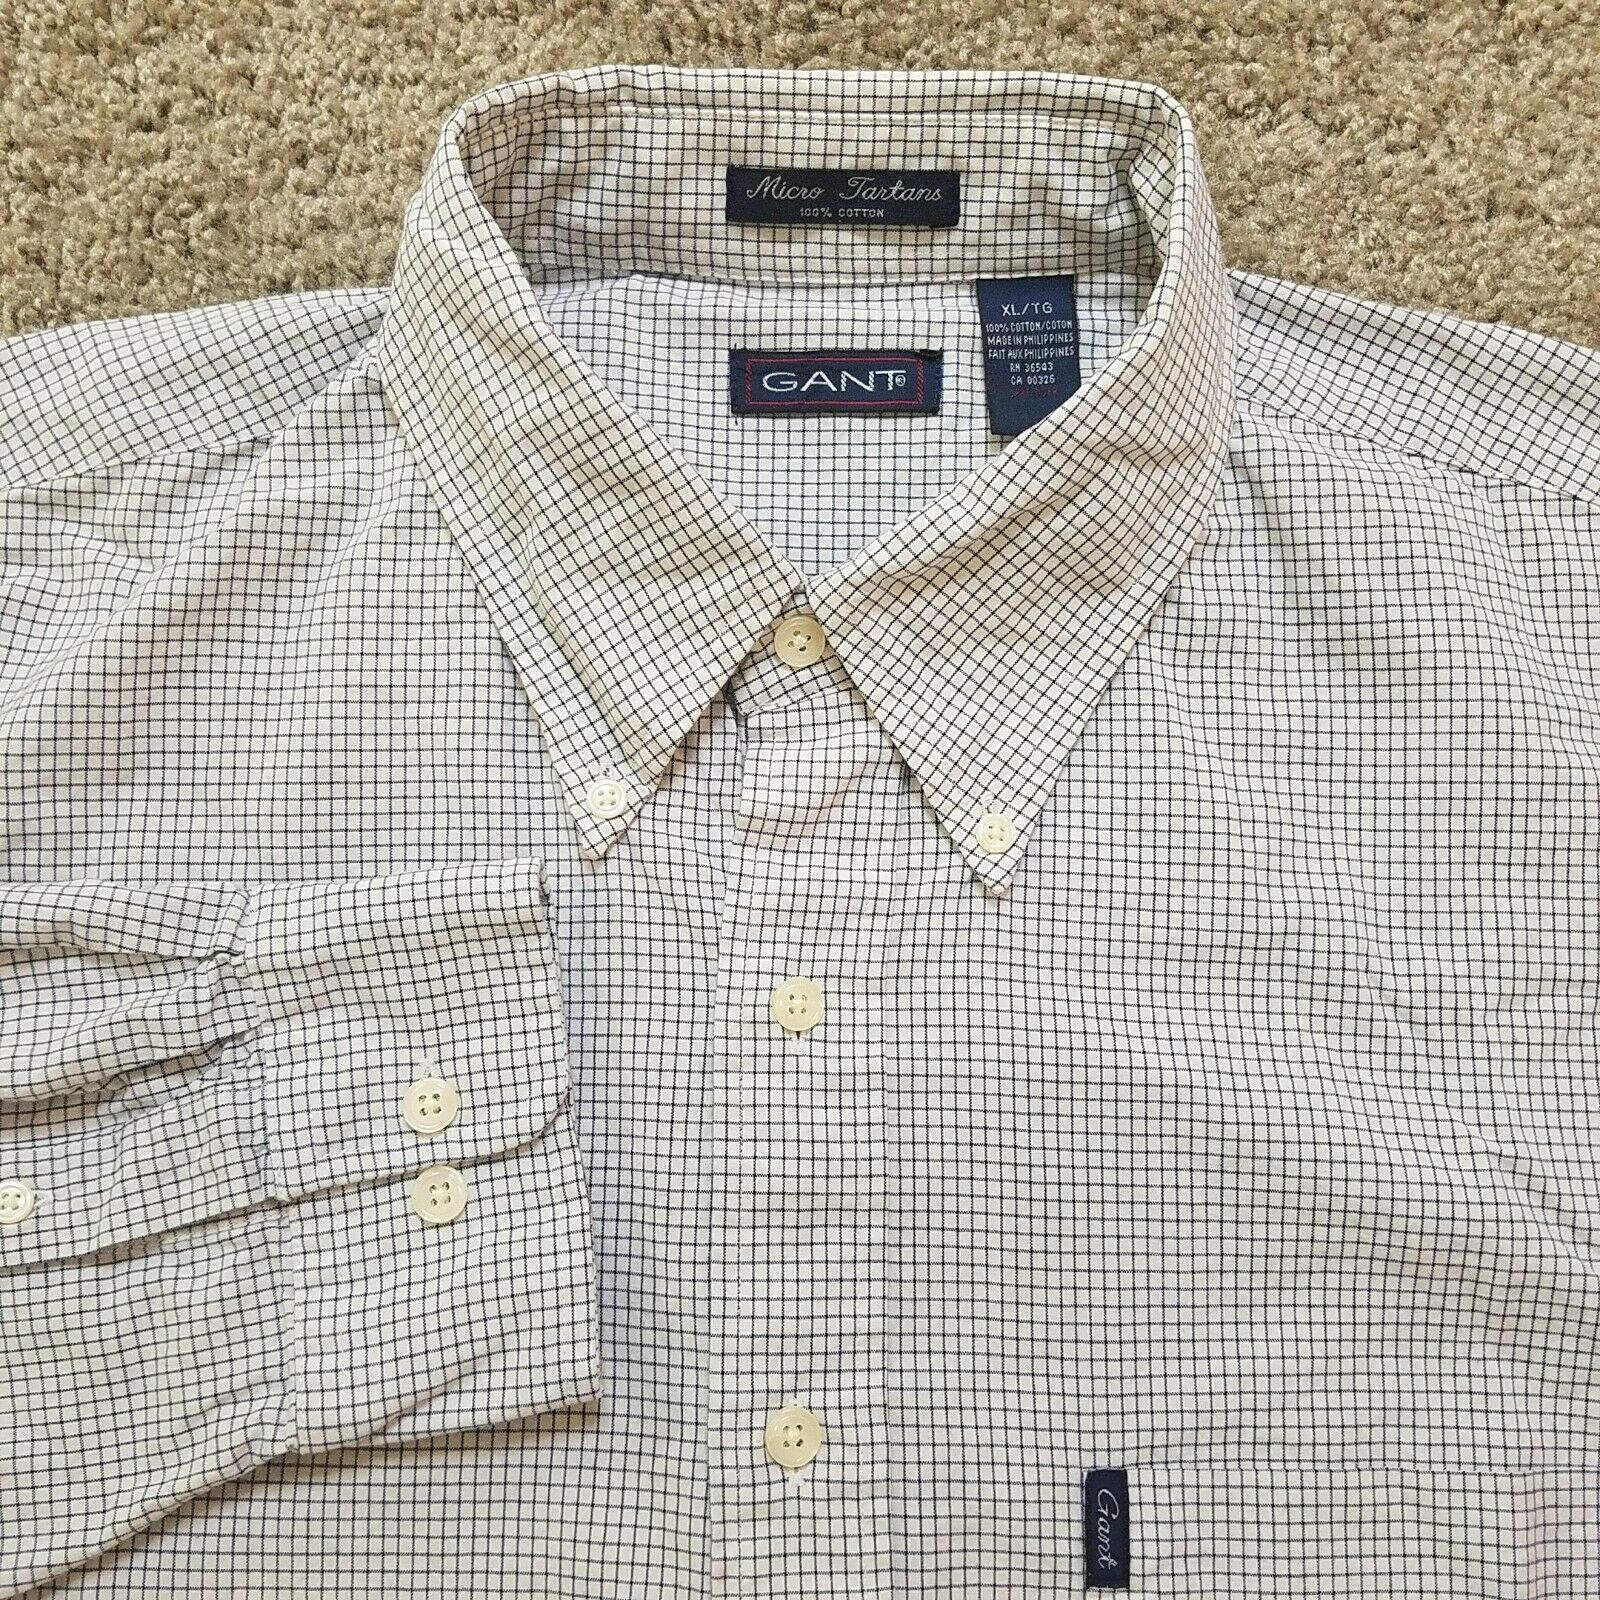 Gant USA XL Micro Tartans Shirt White and Black C… - image 1